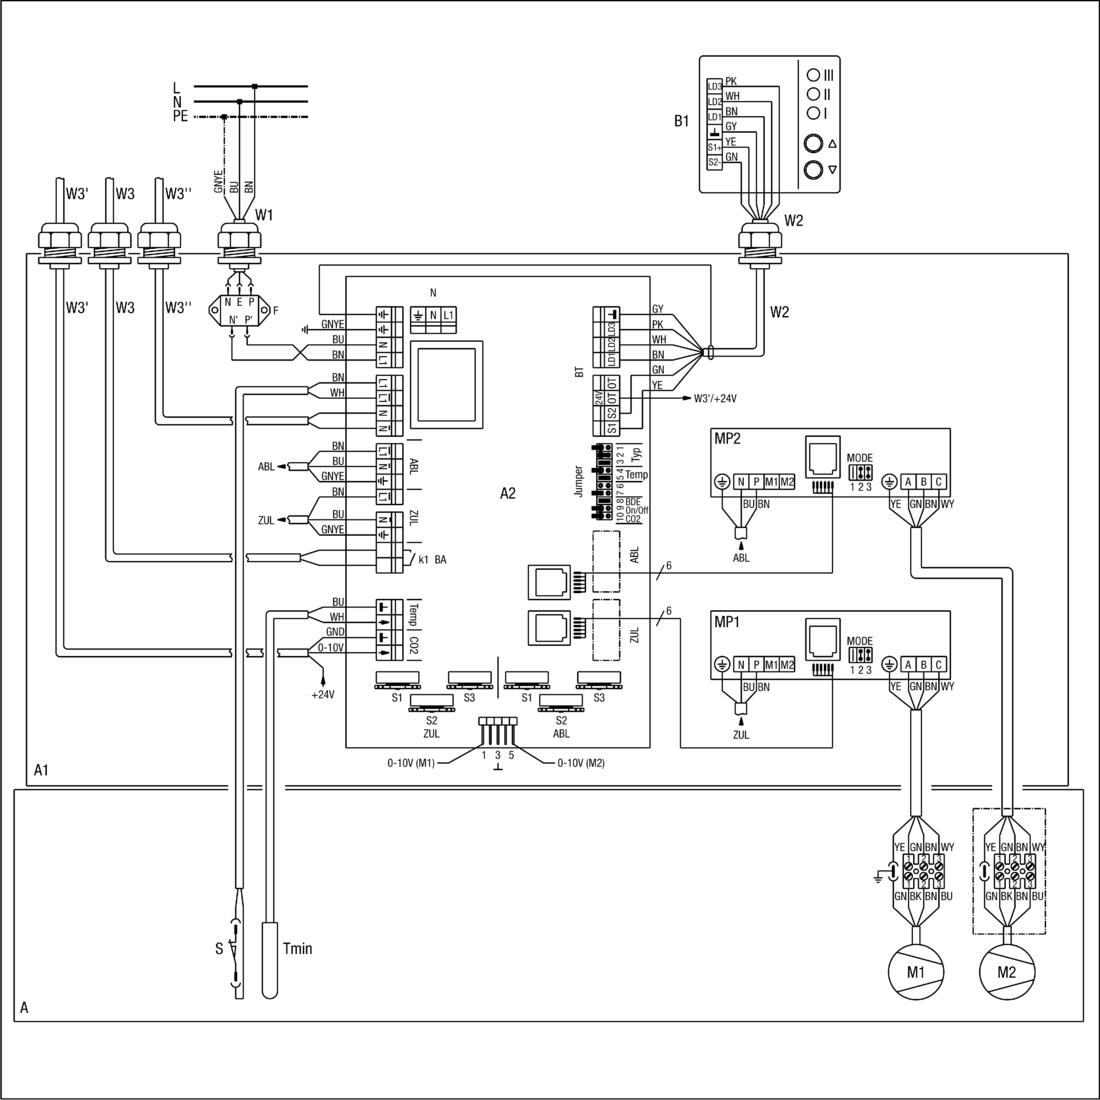 centralised ventilation unit wr 600